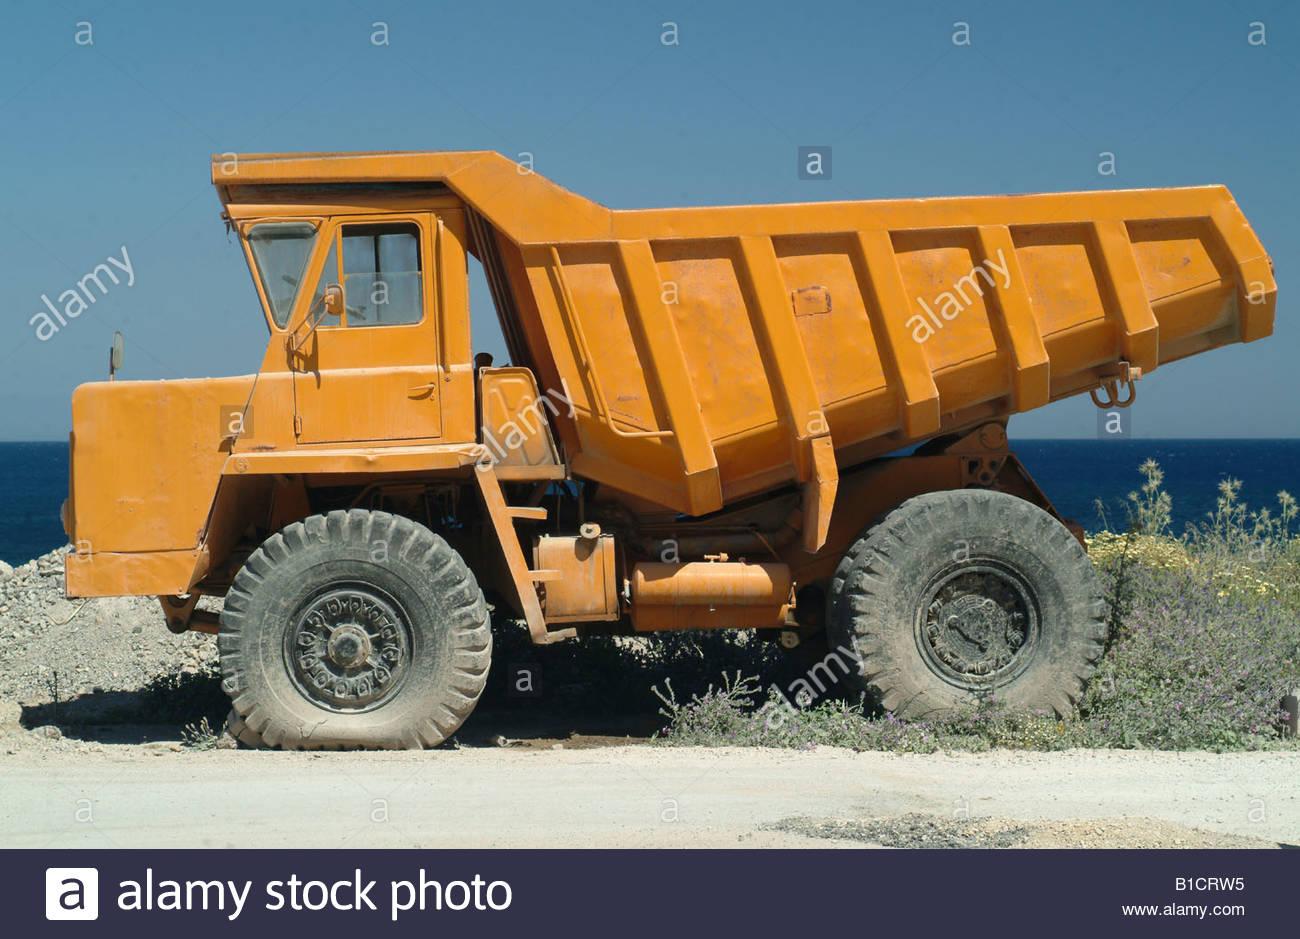 Large heavy duty yellow tipper lorry vehicle truck trucks Orange lorry dump truck dumper Construction nice photo - Stock Image